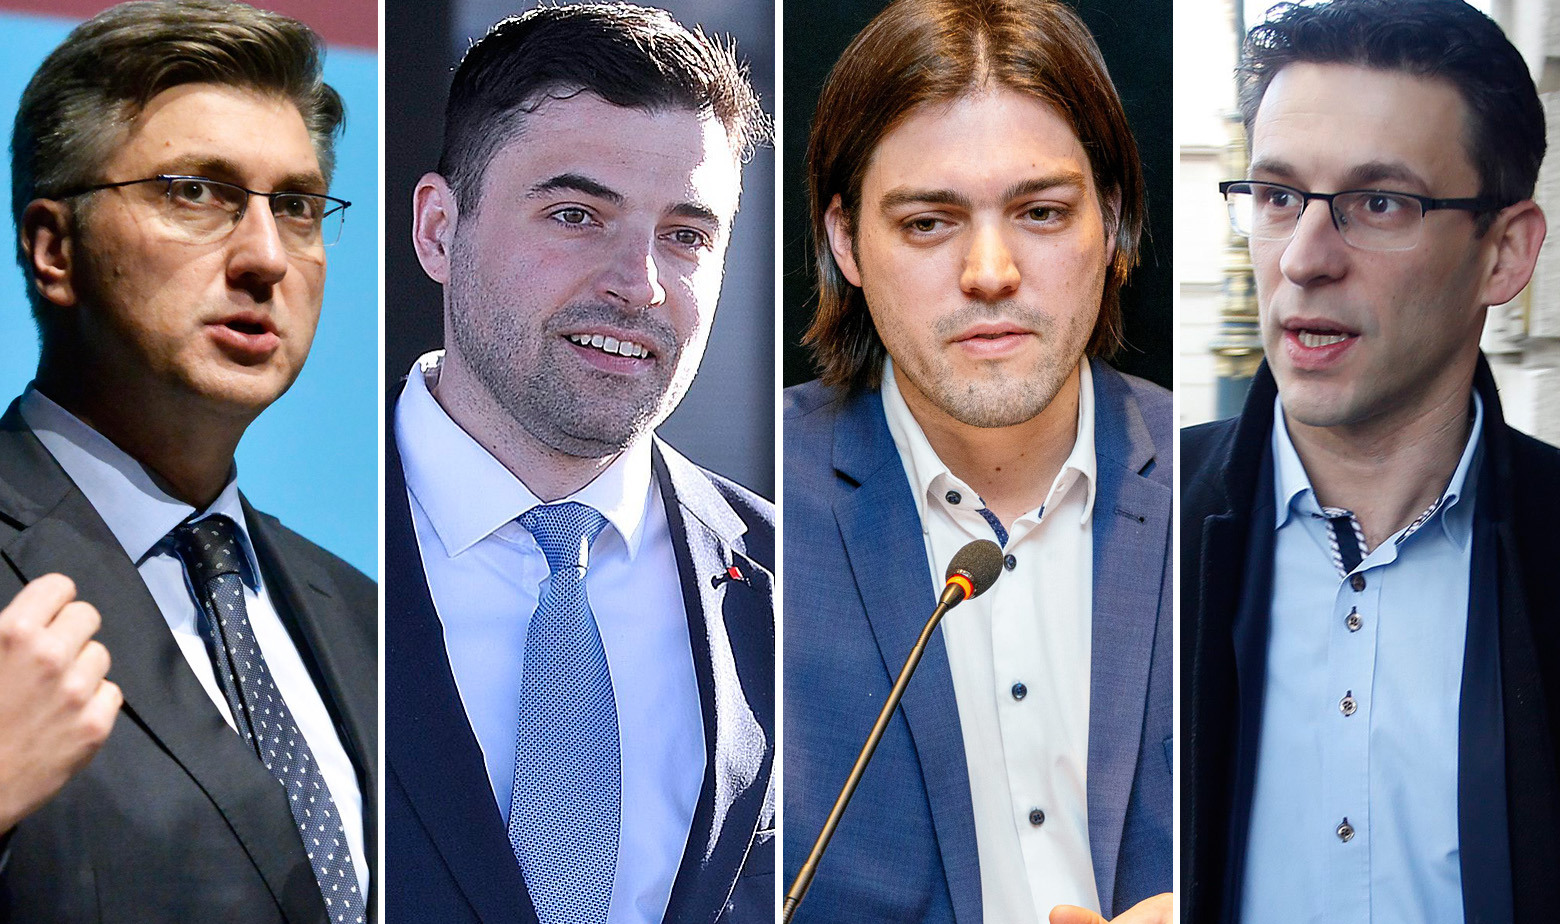 Andrej Plenković, Davor Bernardić, Ivan Vilibor Sinčić i Božo Petrov